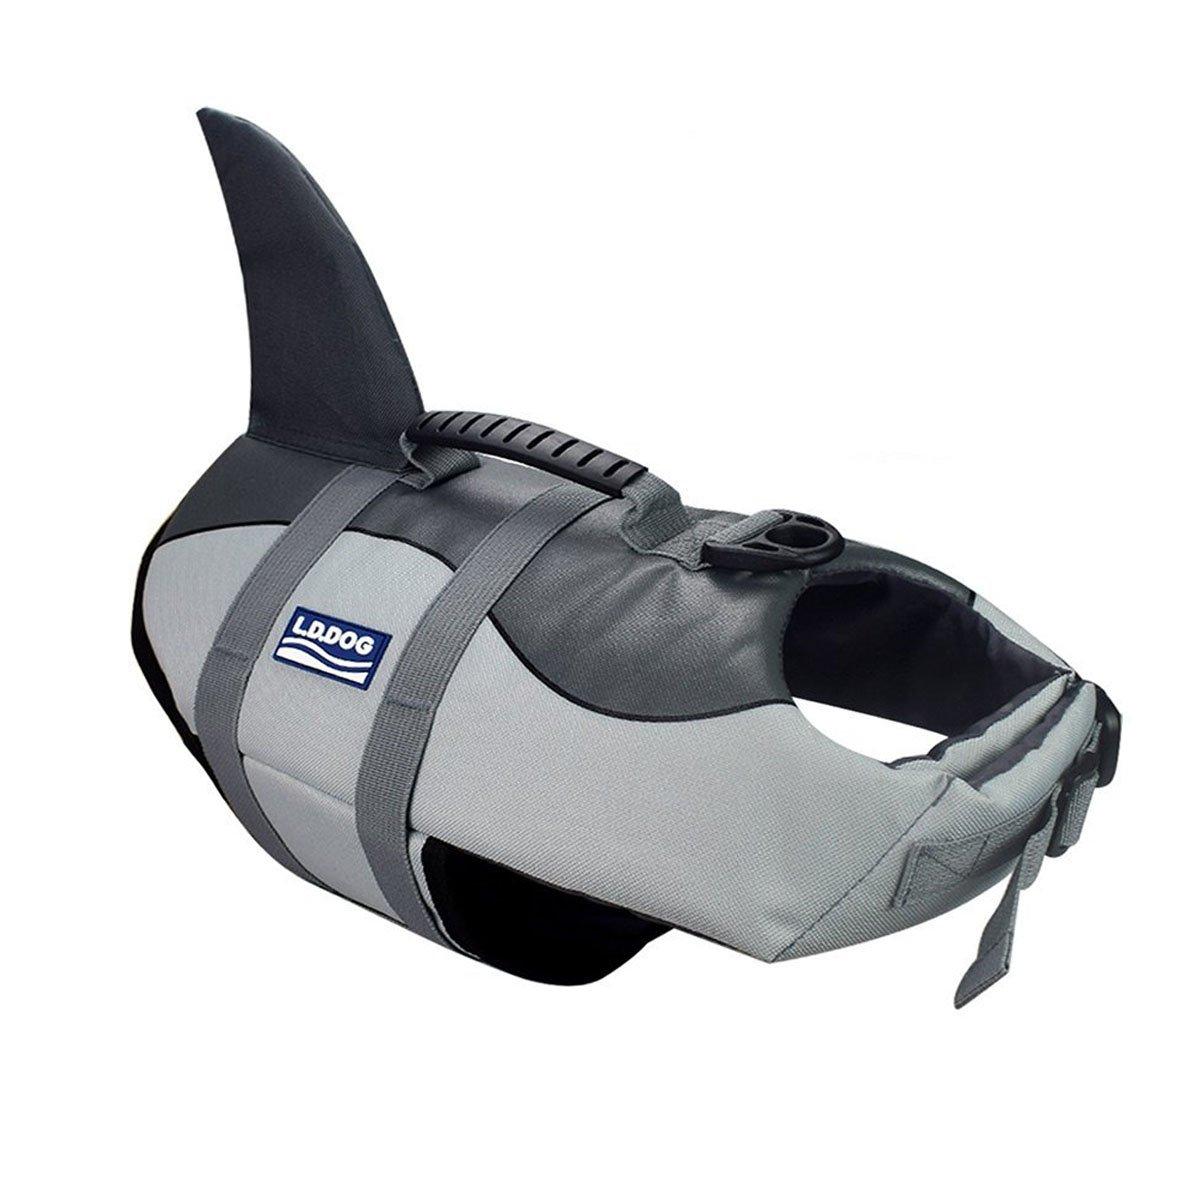 A-MORE Dog life jackets Dog saver Life Jacket Dog Swimming Vest Adjustable Life Jacket for Dogs (M, Grey) by A-MORE